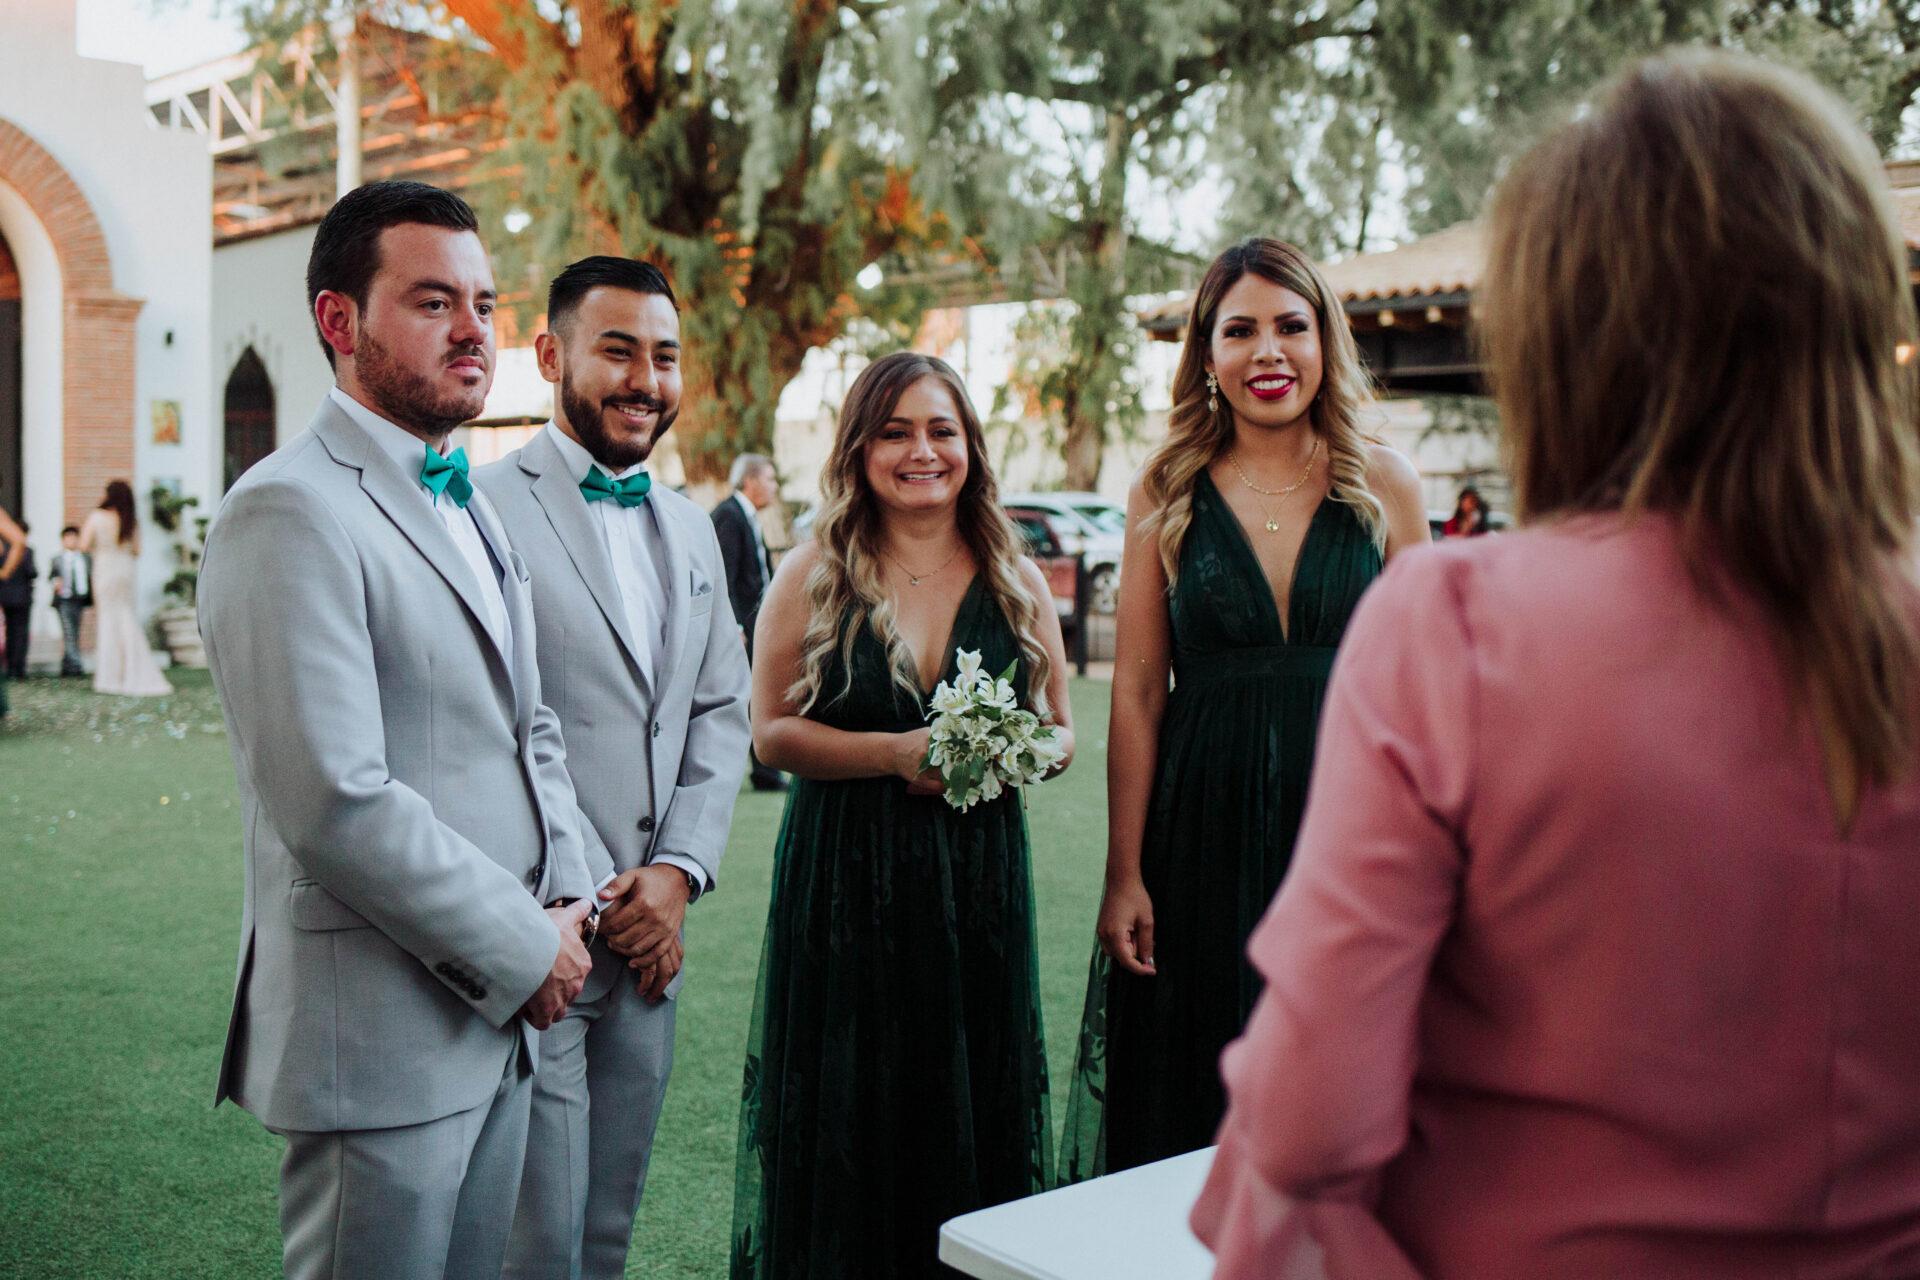 javier_noriega_fotografo_bodas_torreon_coahuila_zacatecas_wedding_photographer37a